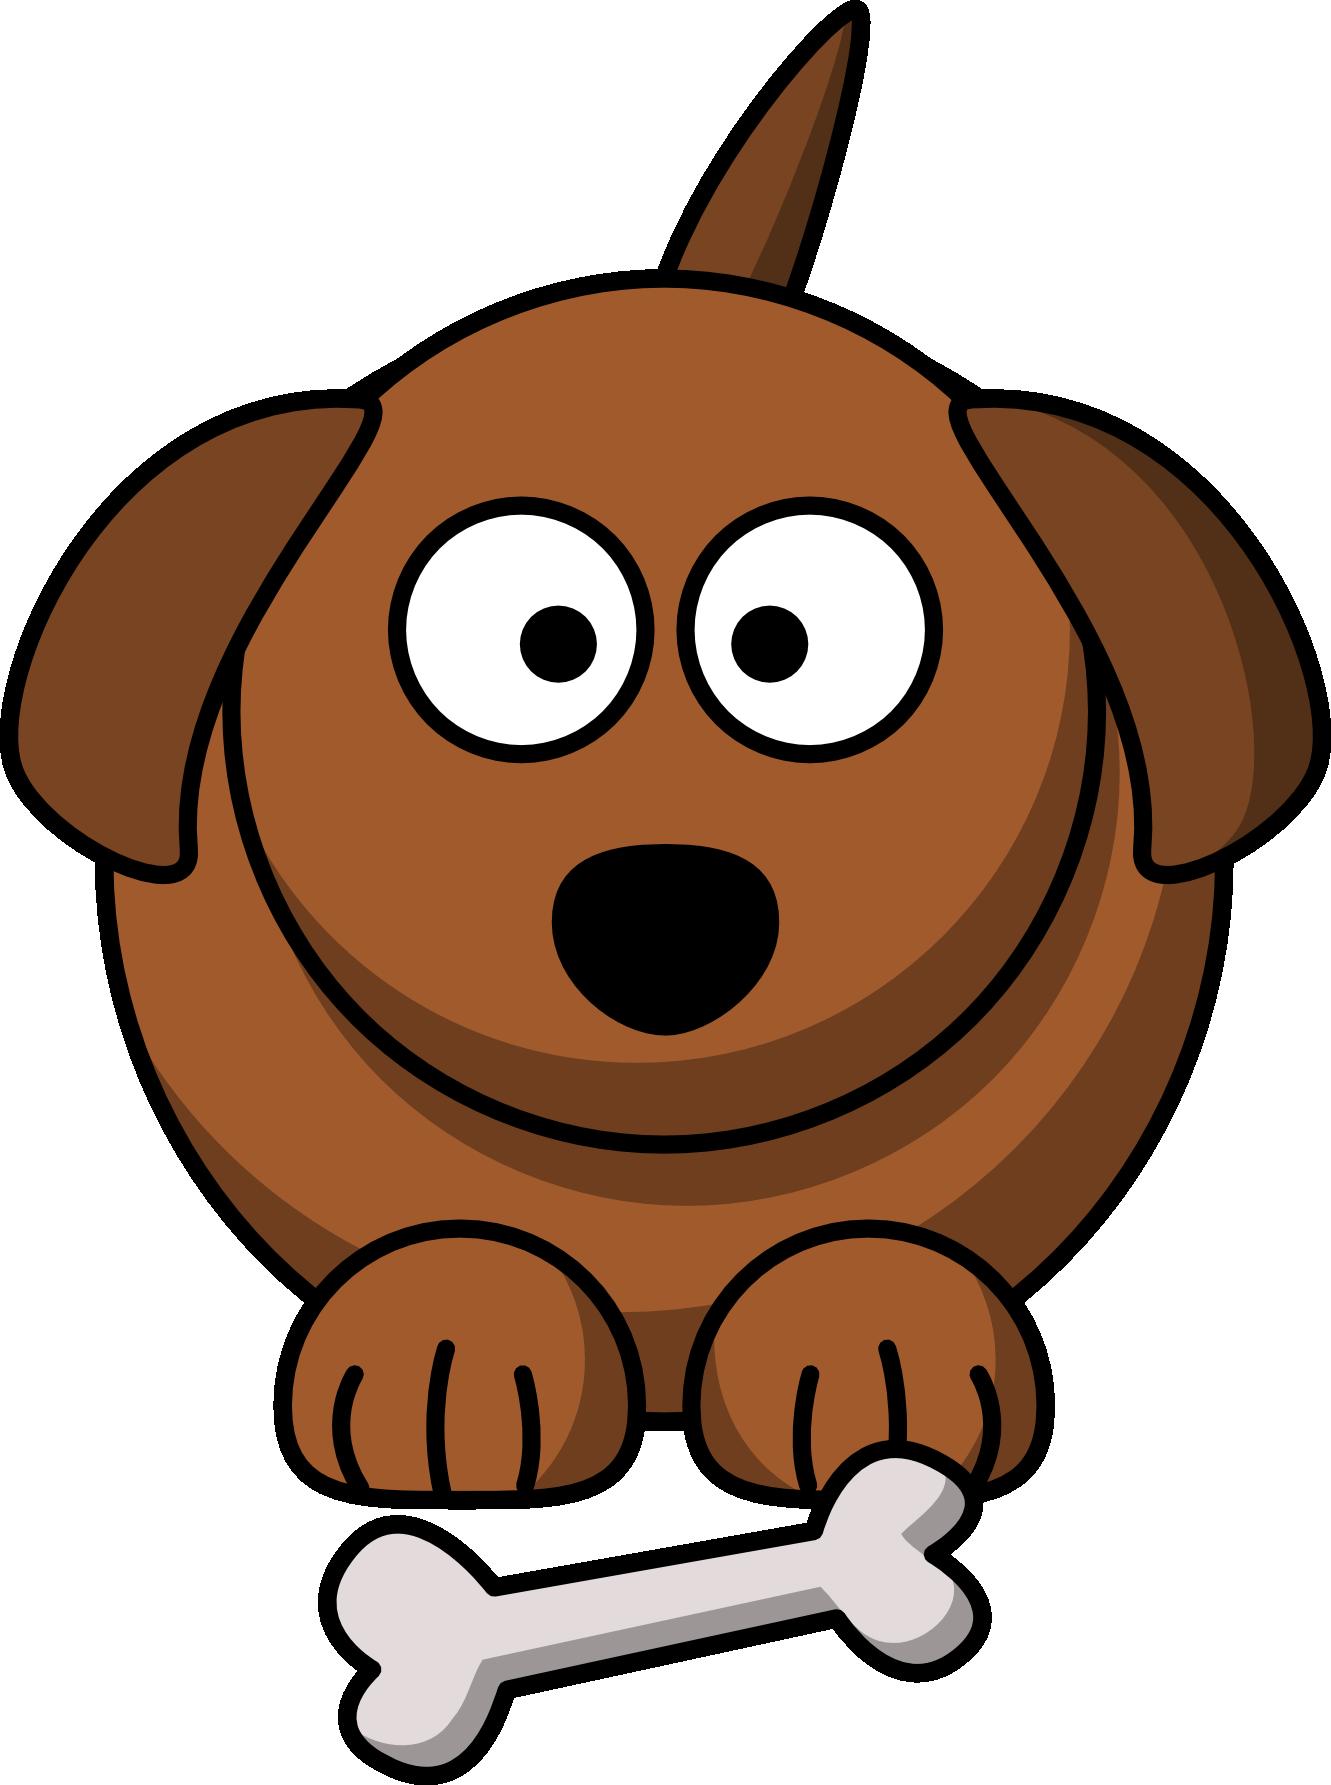 Clipart dogs xmas. Christmas dog bone panda